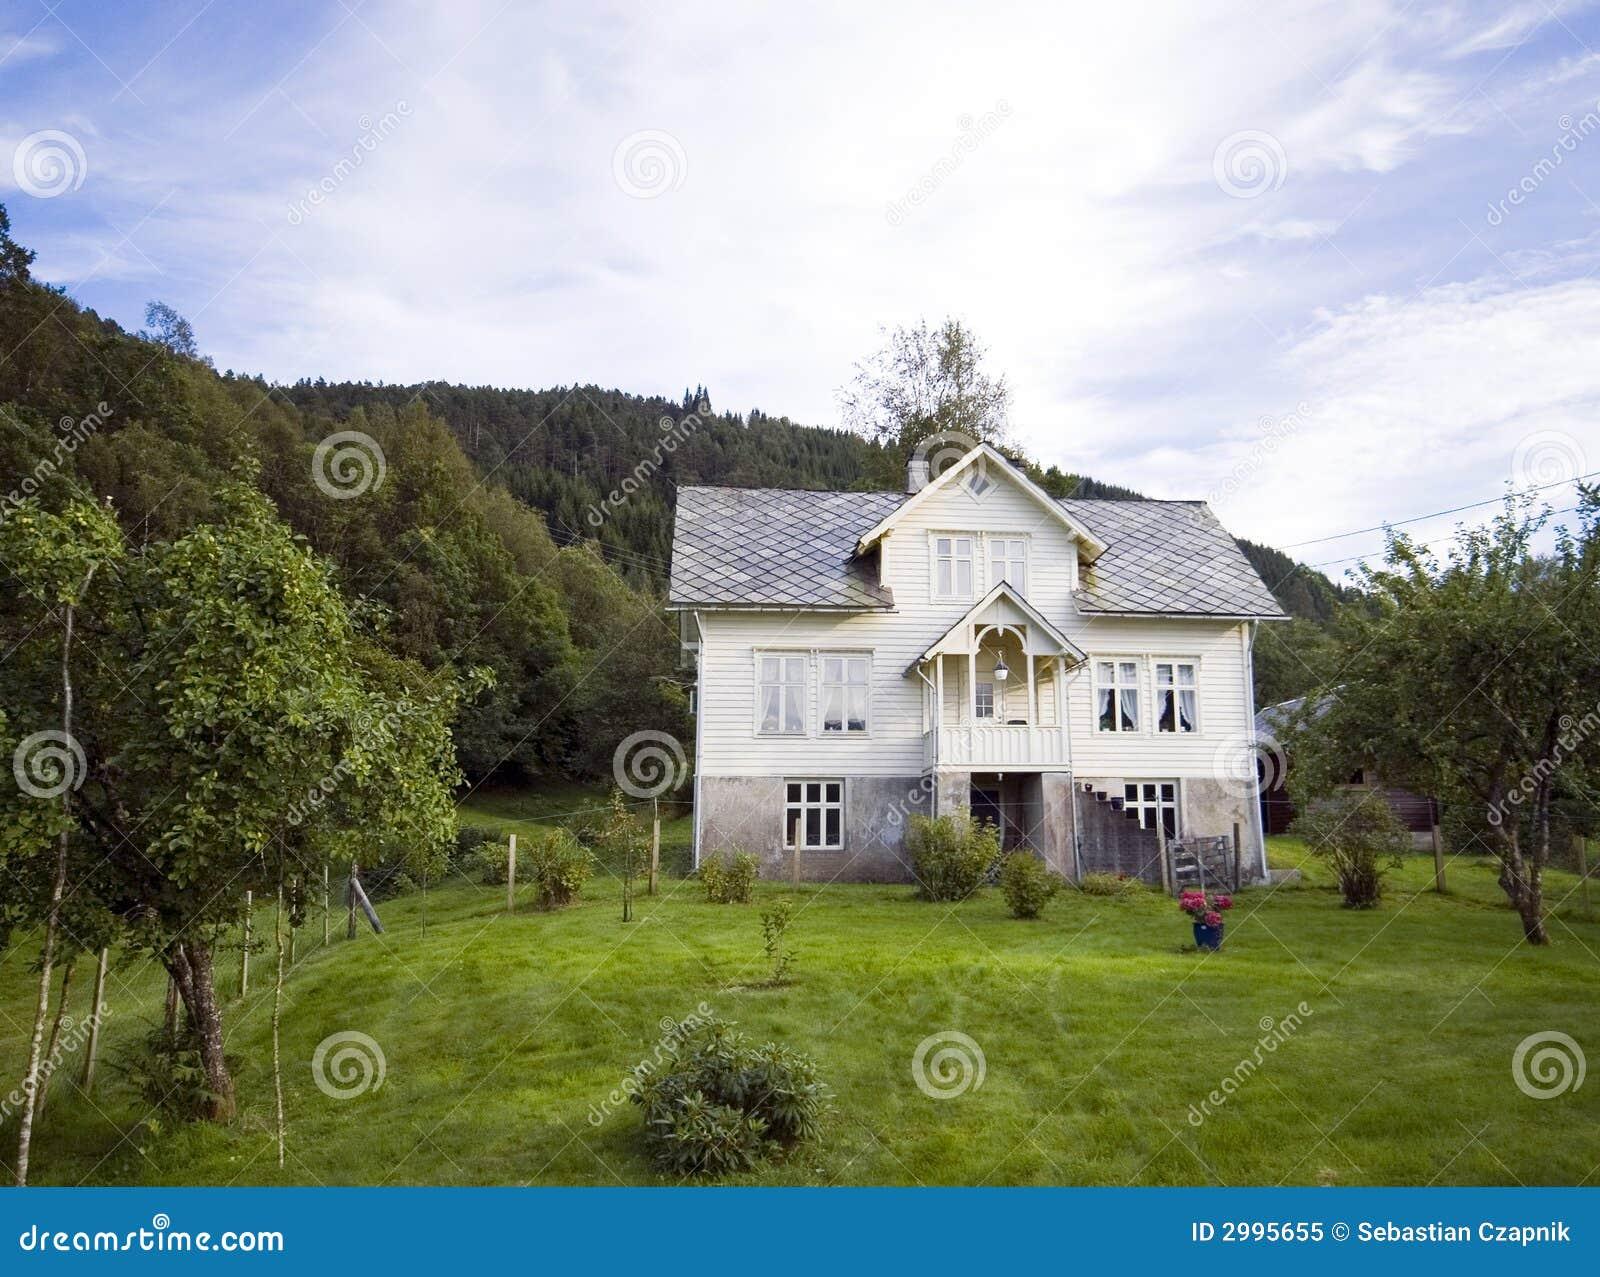 Einsames haus auf h gel norwegen for Norwegen haus